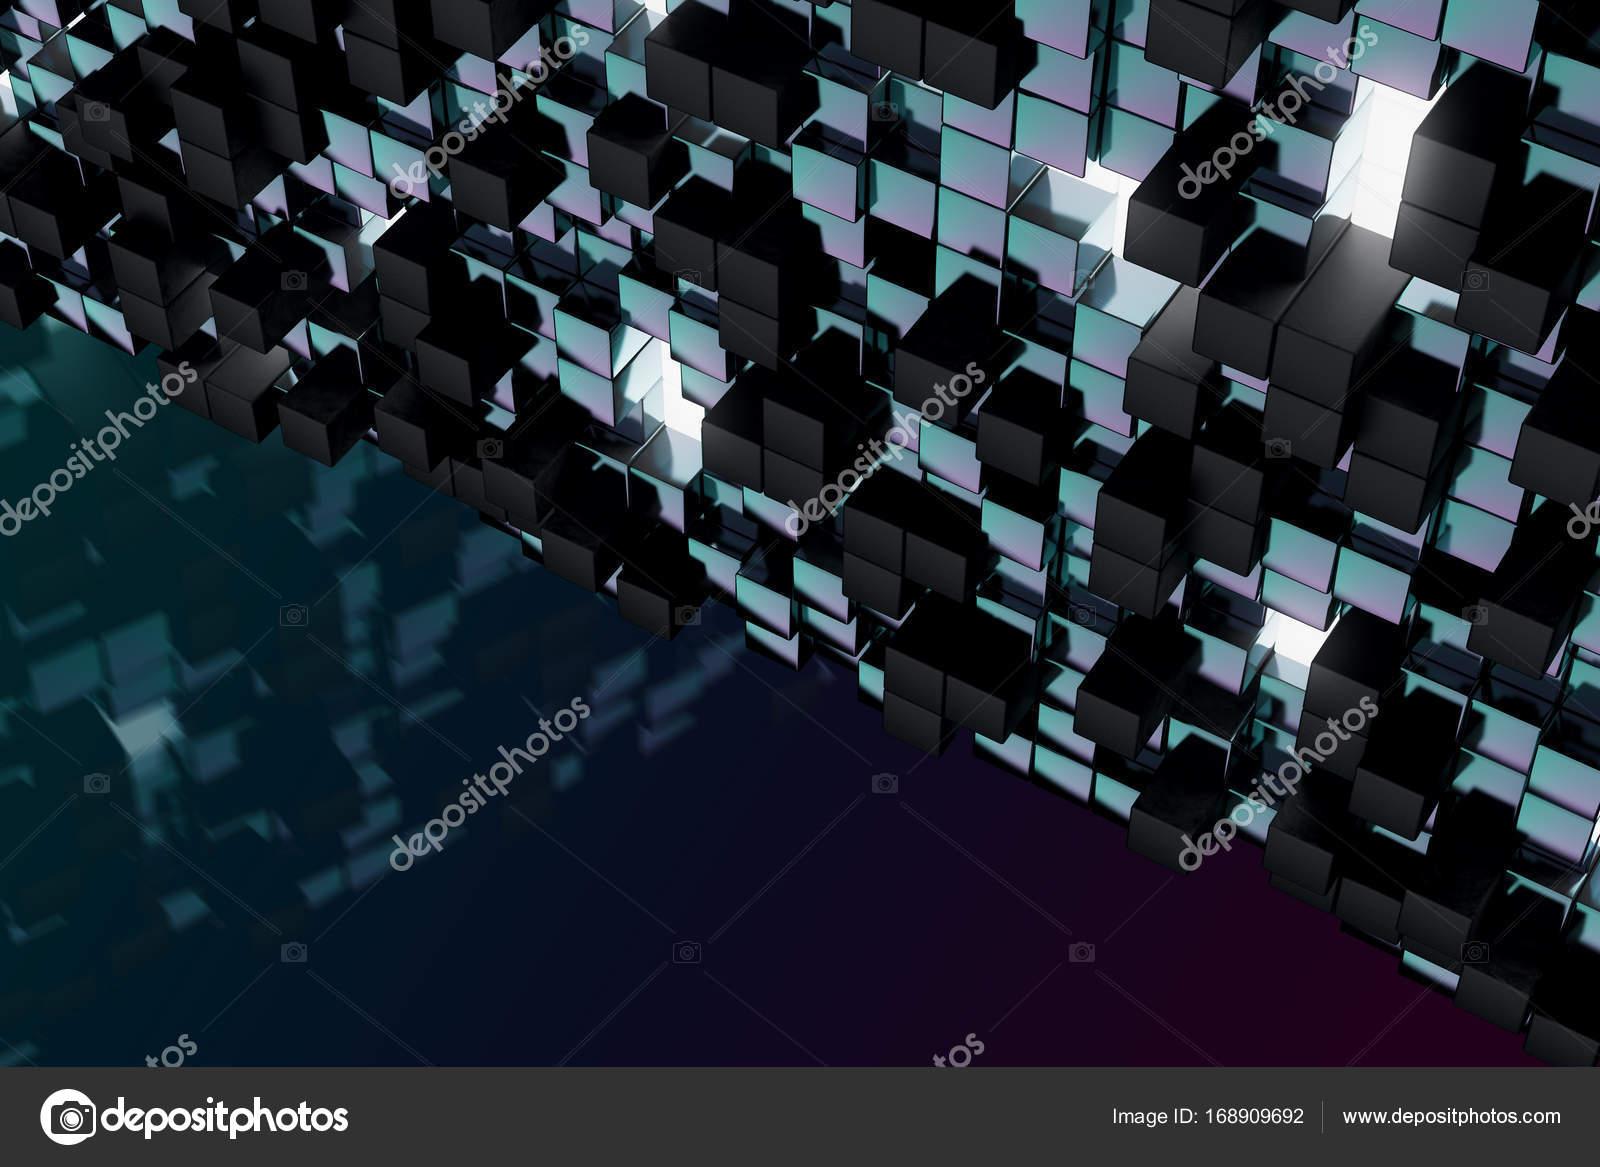 Abstract Dark Cube Wallpaper Geometry Design Concept 3D Rendering Photo By Peshkova